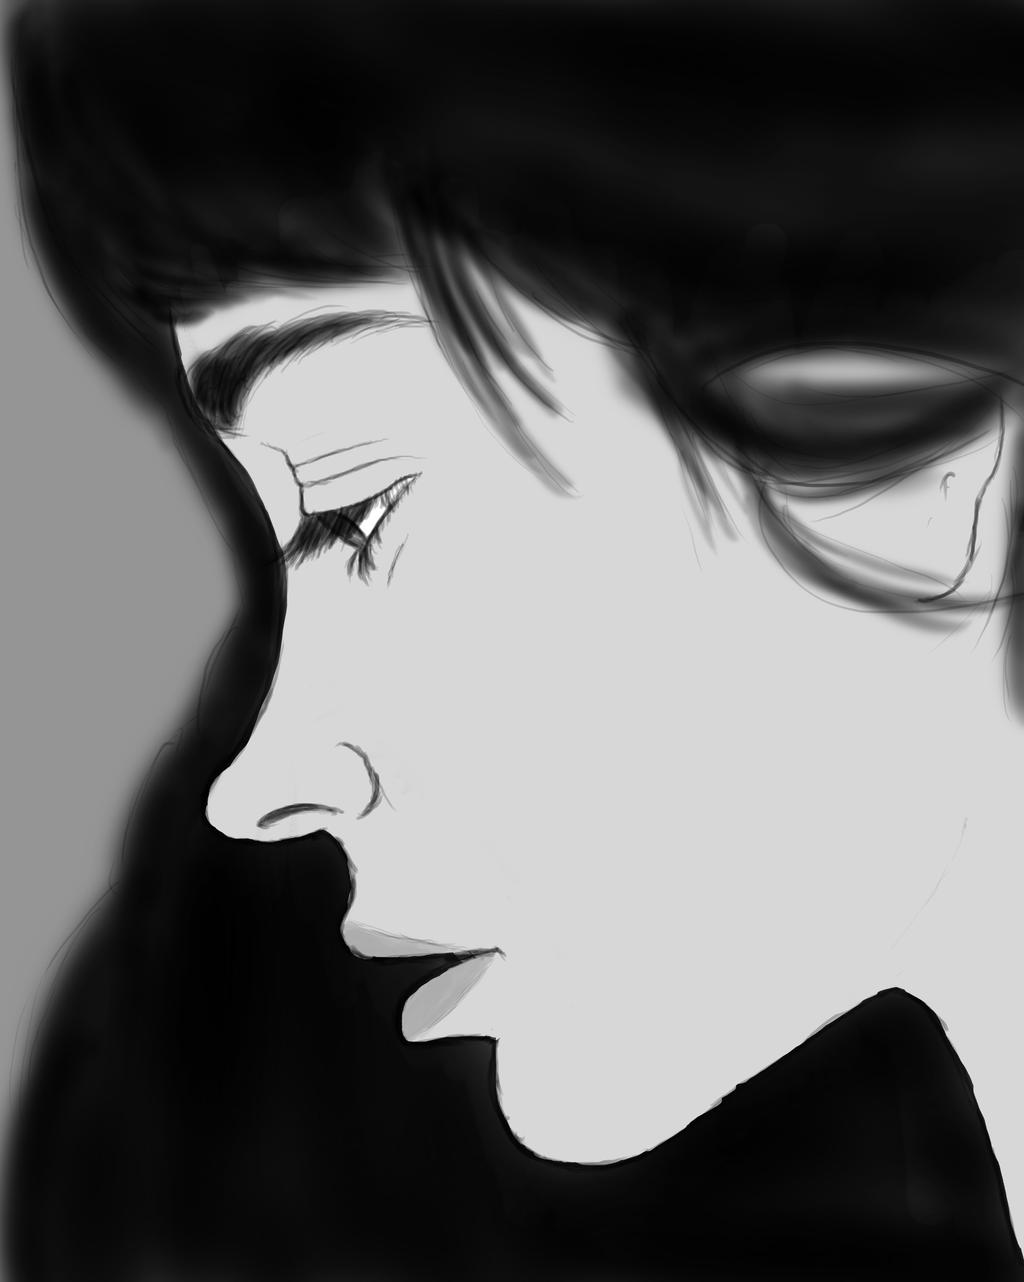 Dark Haired Girl Daily sketch #842 by GothicVampireFreak